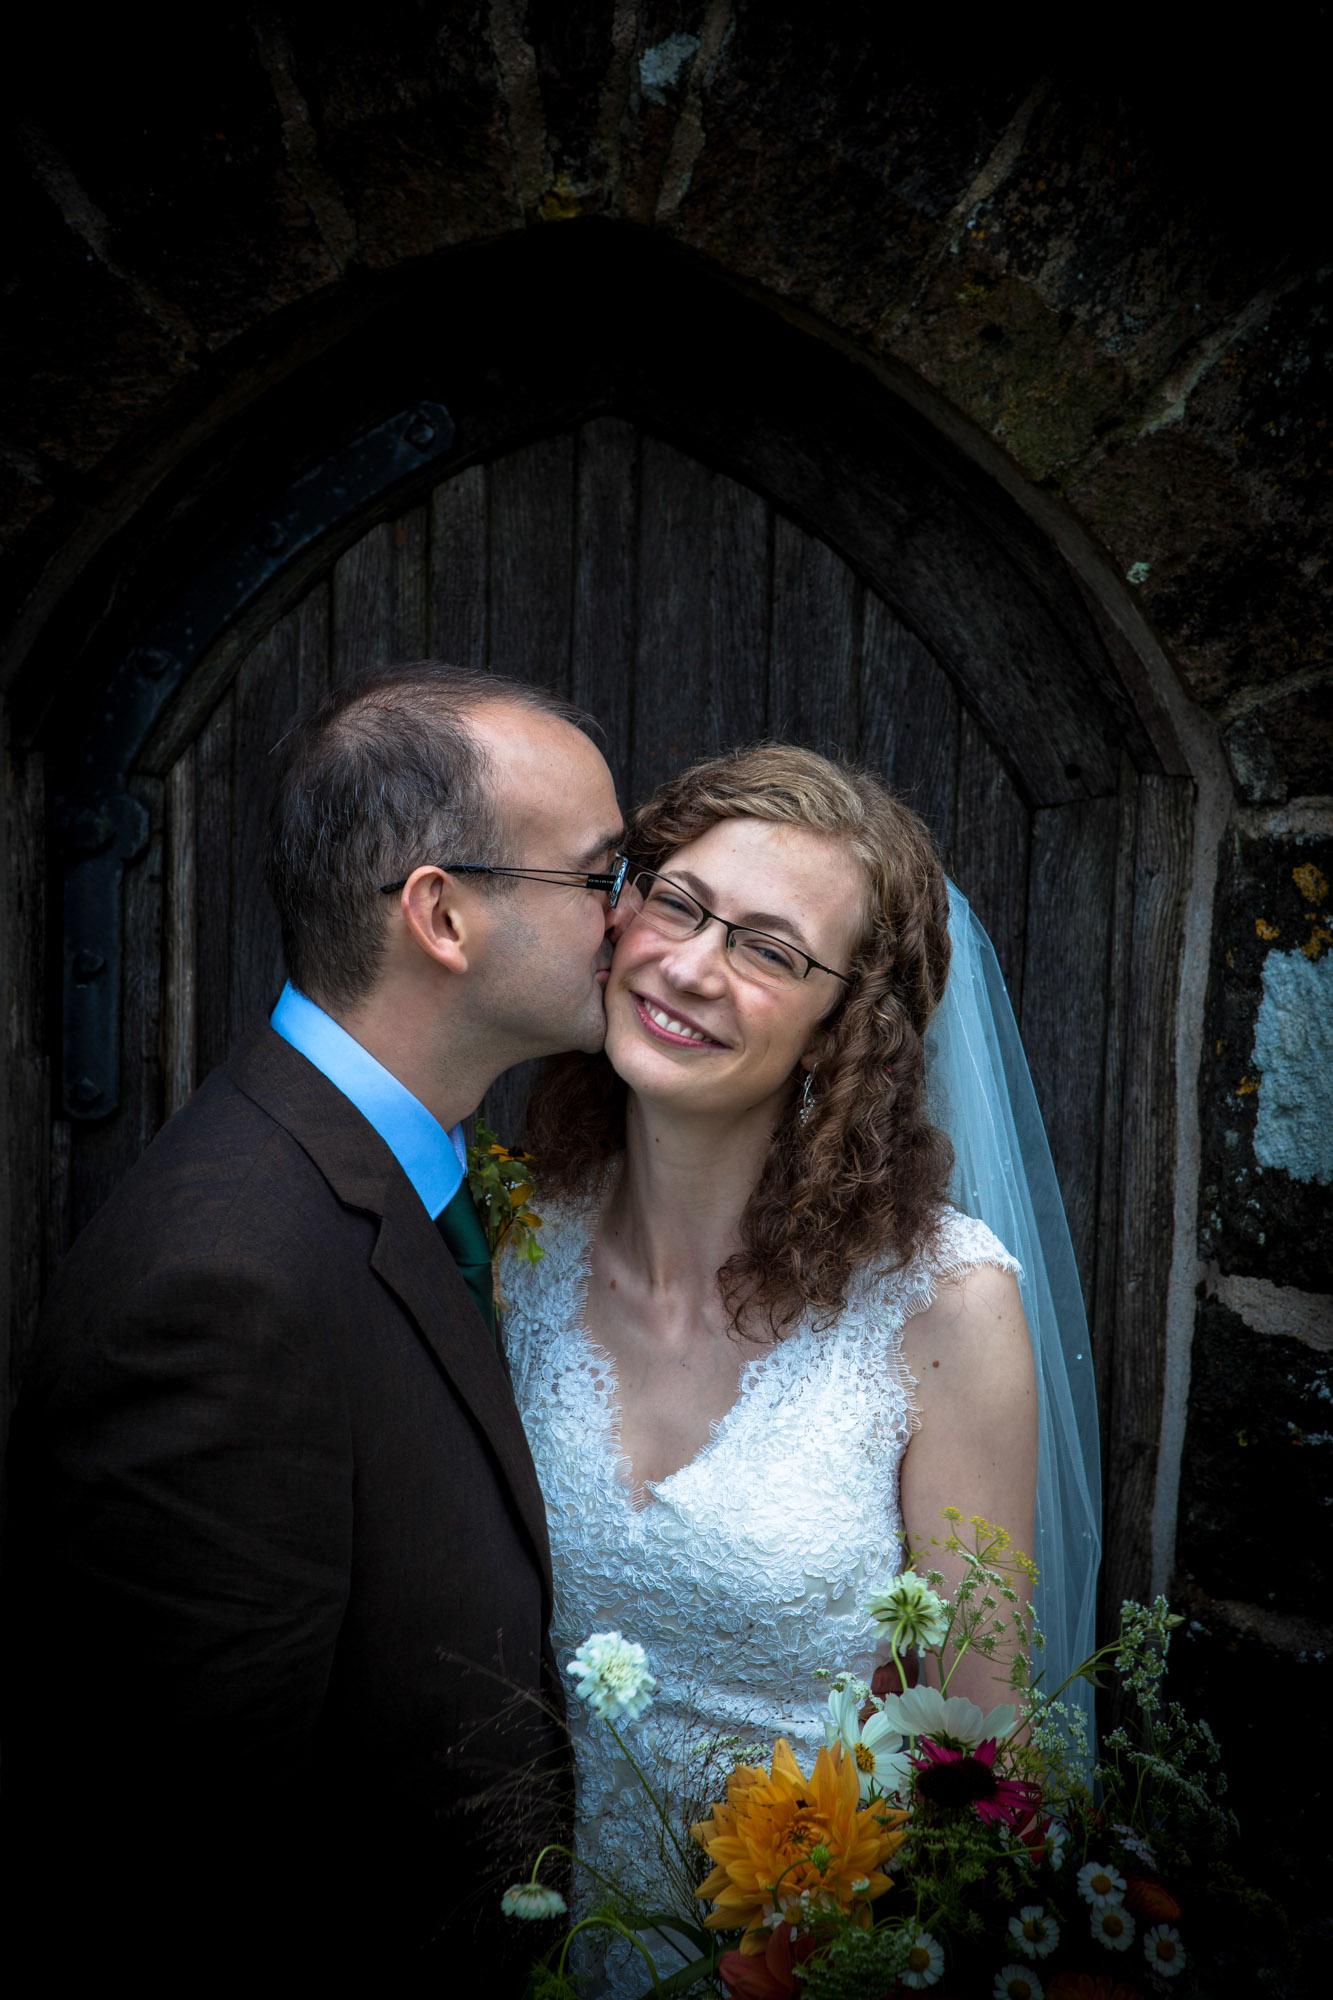 weddings-couples-love-photographer-oxford-london-jonathan-self-photography-63.jpg